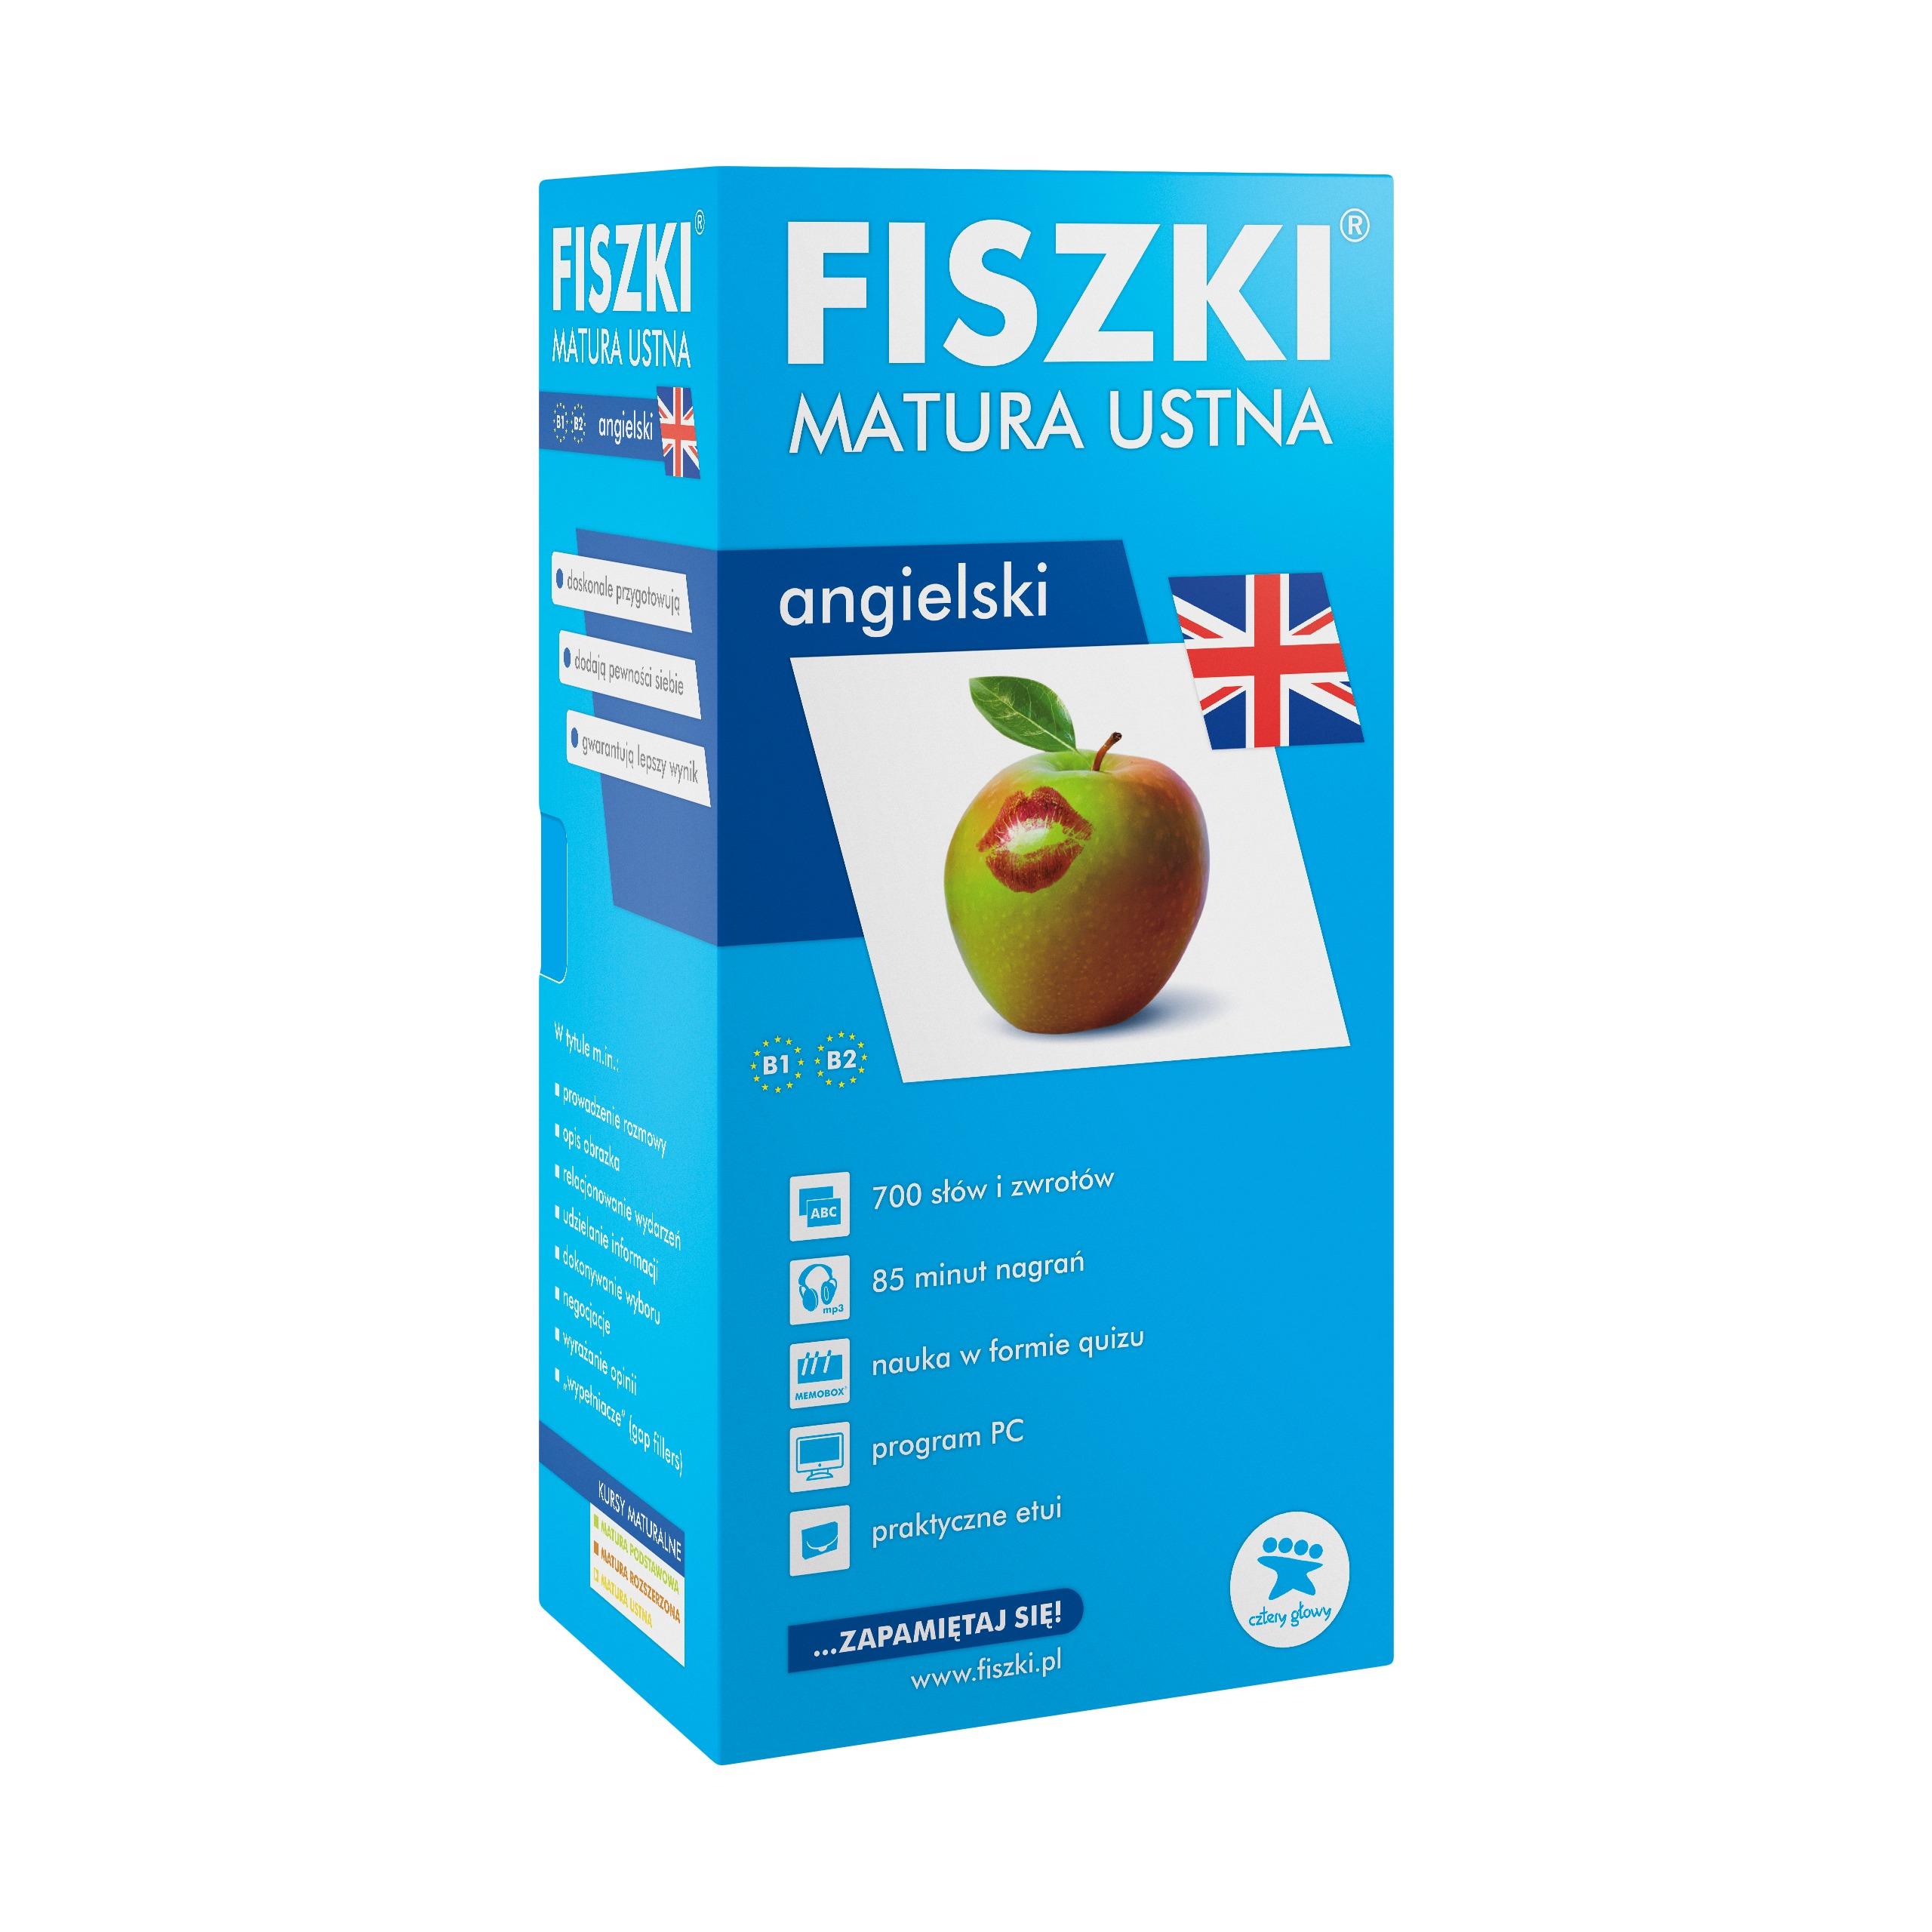 FISZKI - angielski - Matura ustna